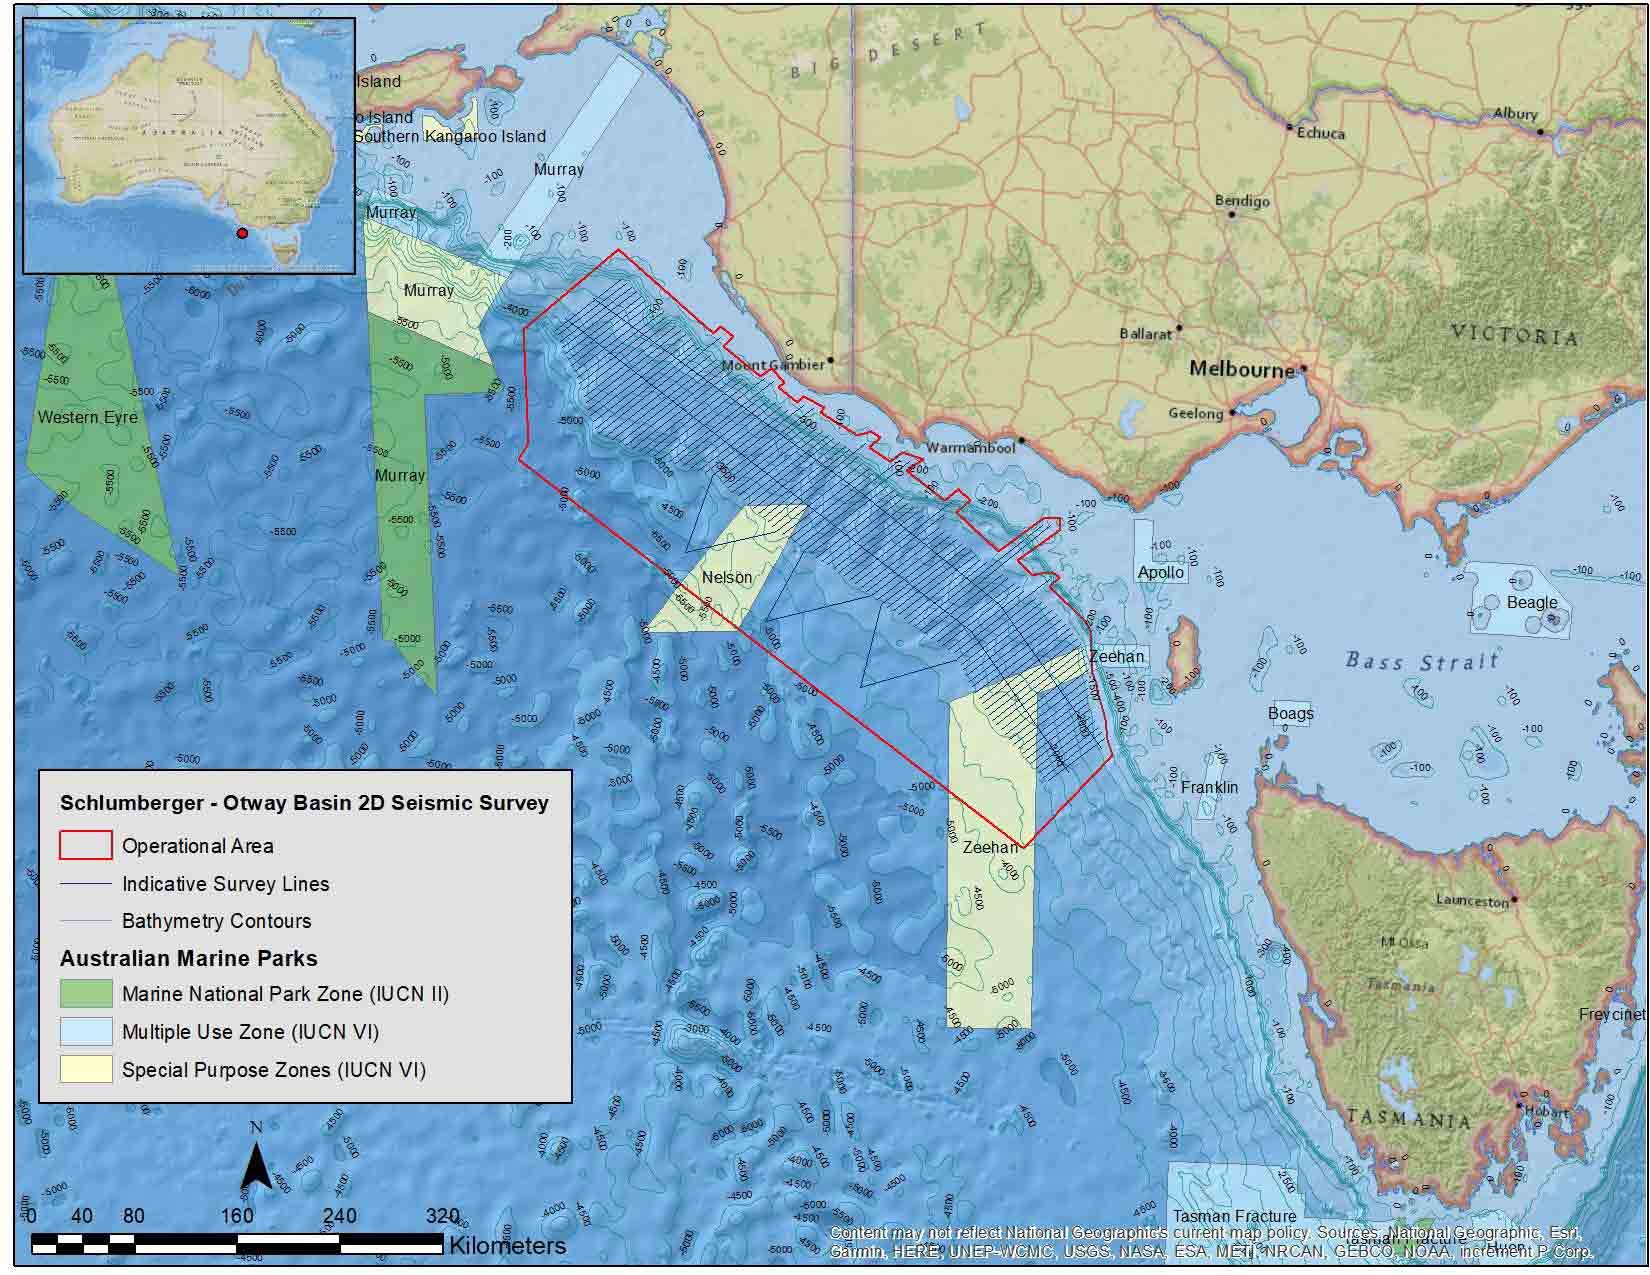 Otway Basin 2DMC Marine Seismic Survey